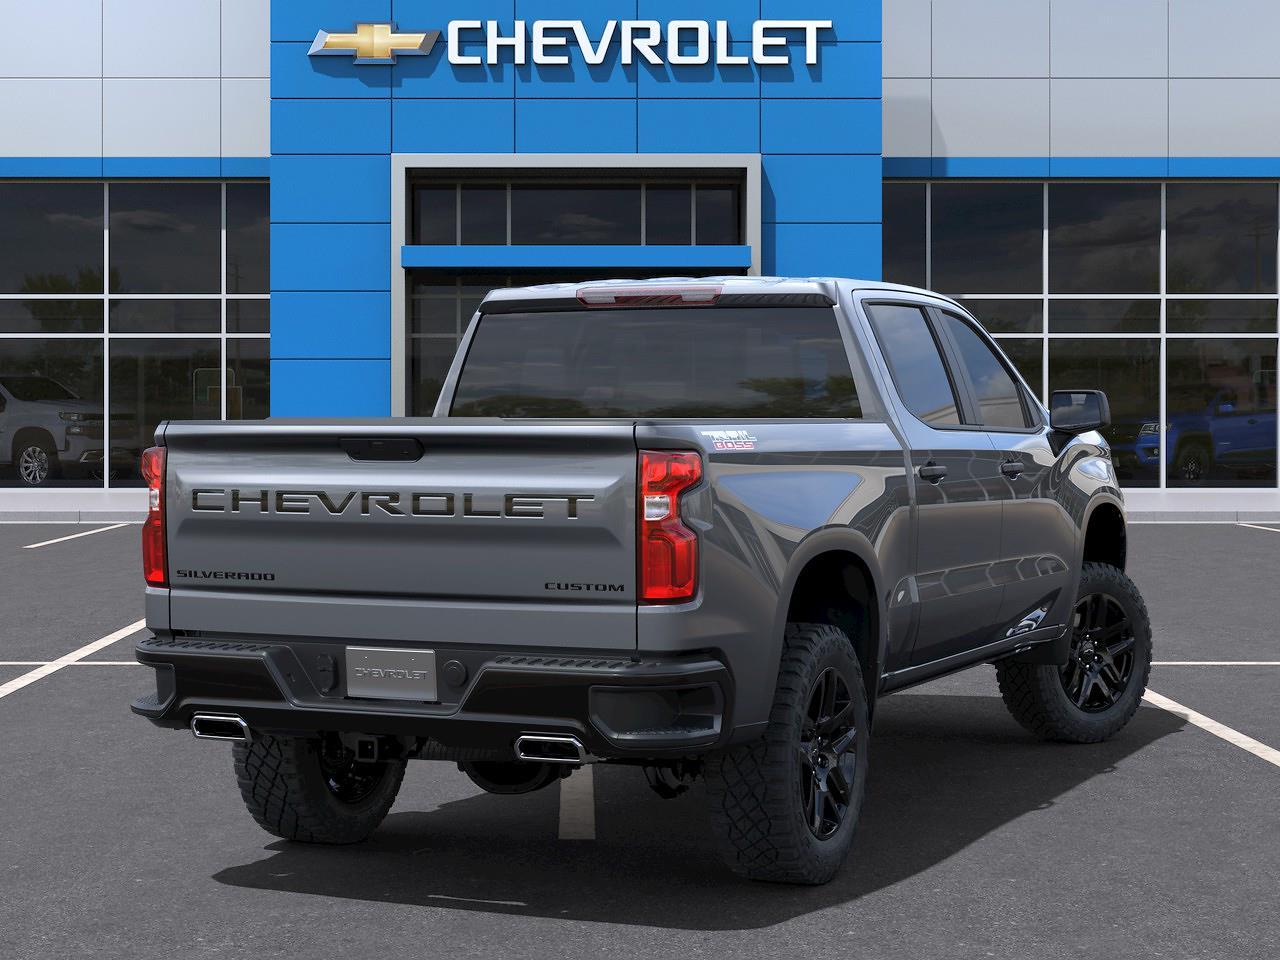 2021 Chevrolet Silverado 1500 Crew Cab 4x4, Pickup #Q210466 - photo 2